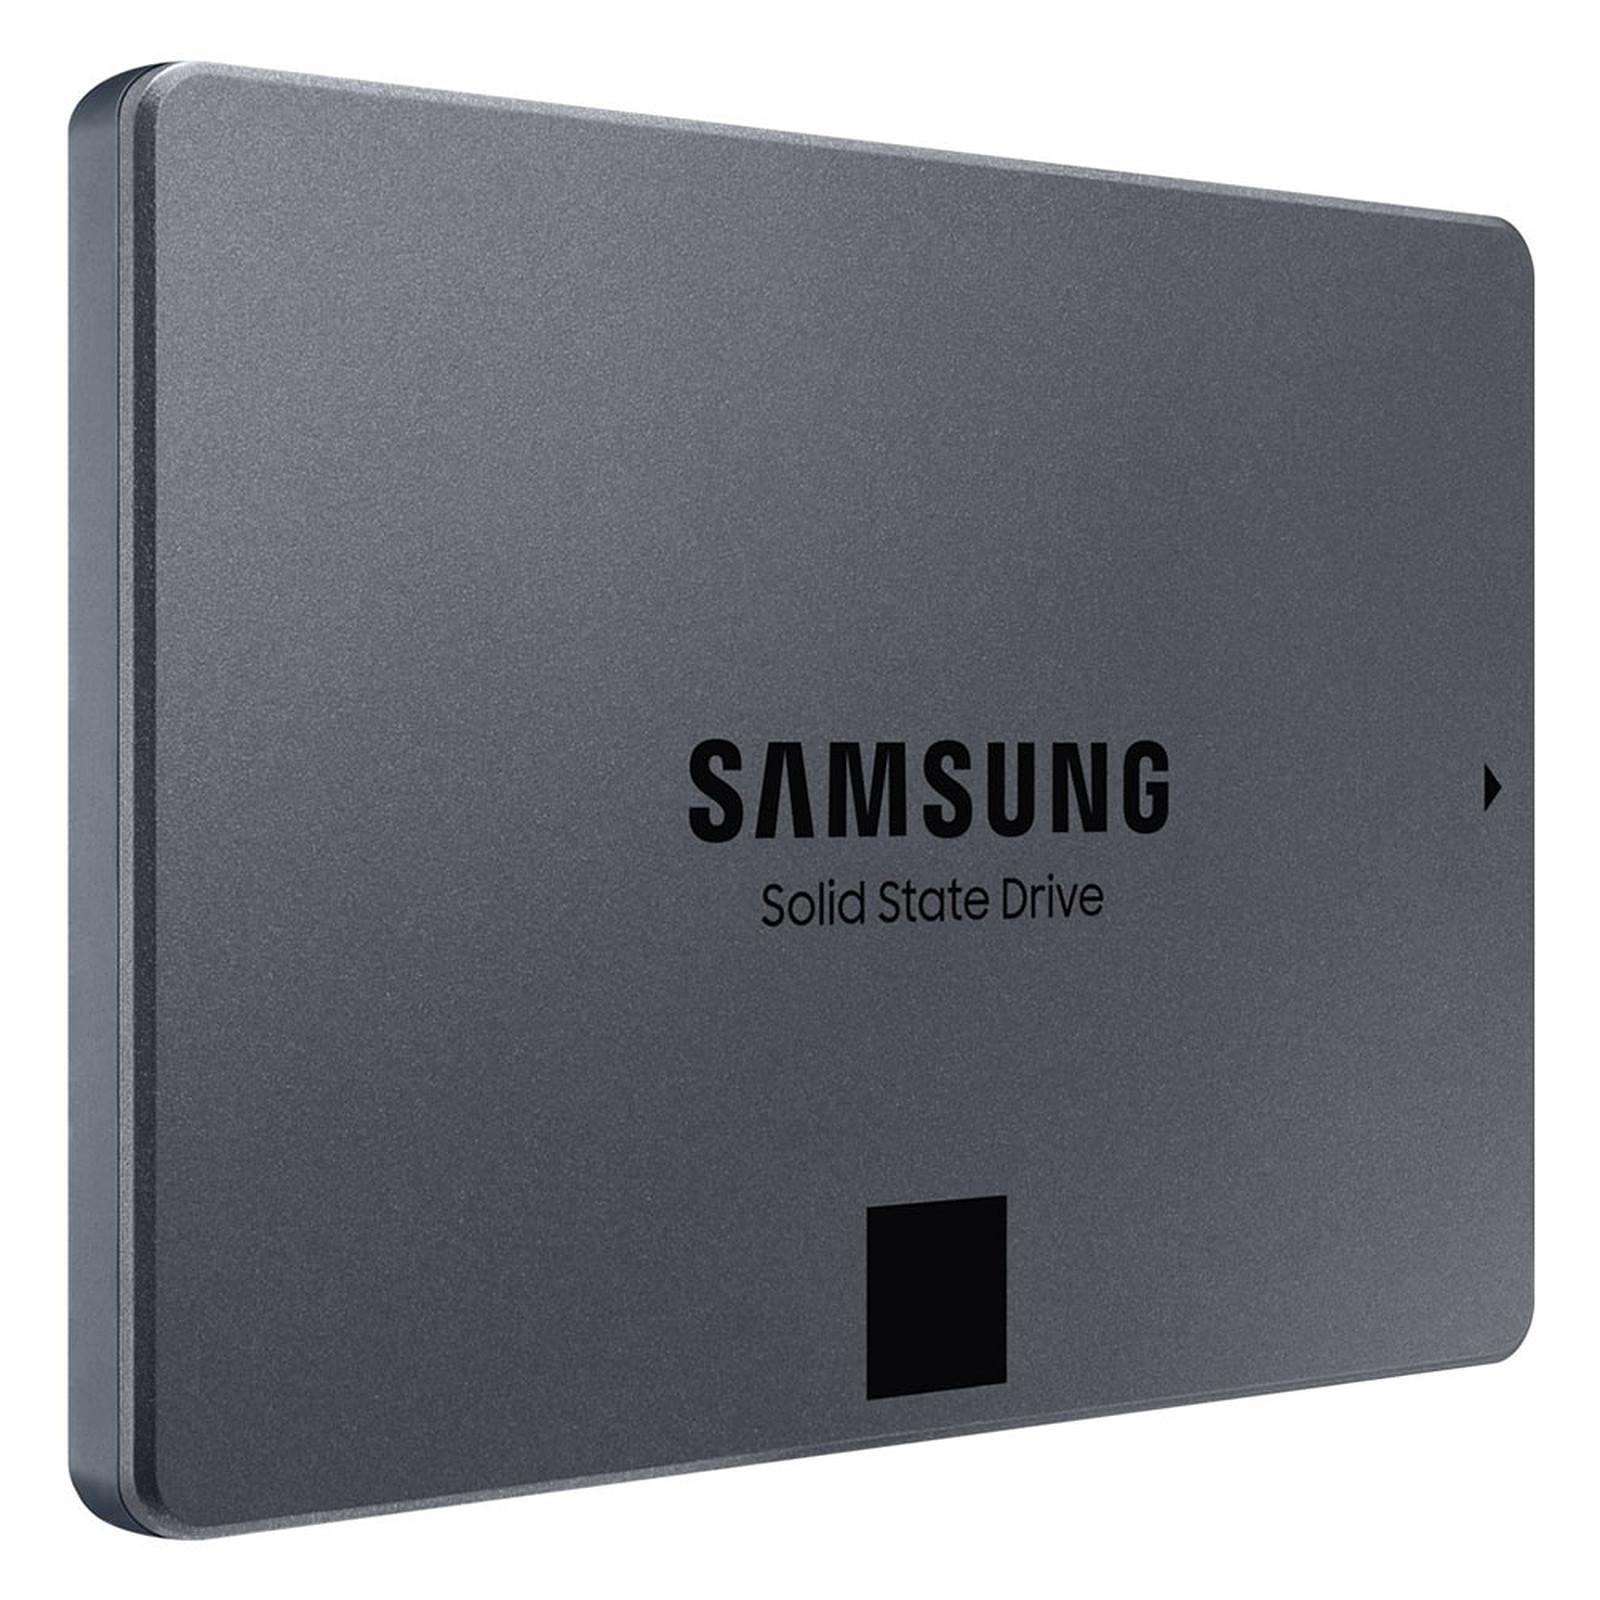 Samsung SSD 870 QVO 4 To